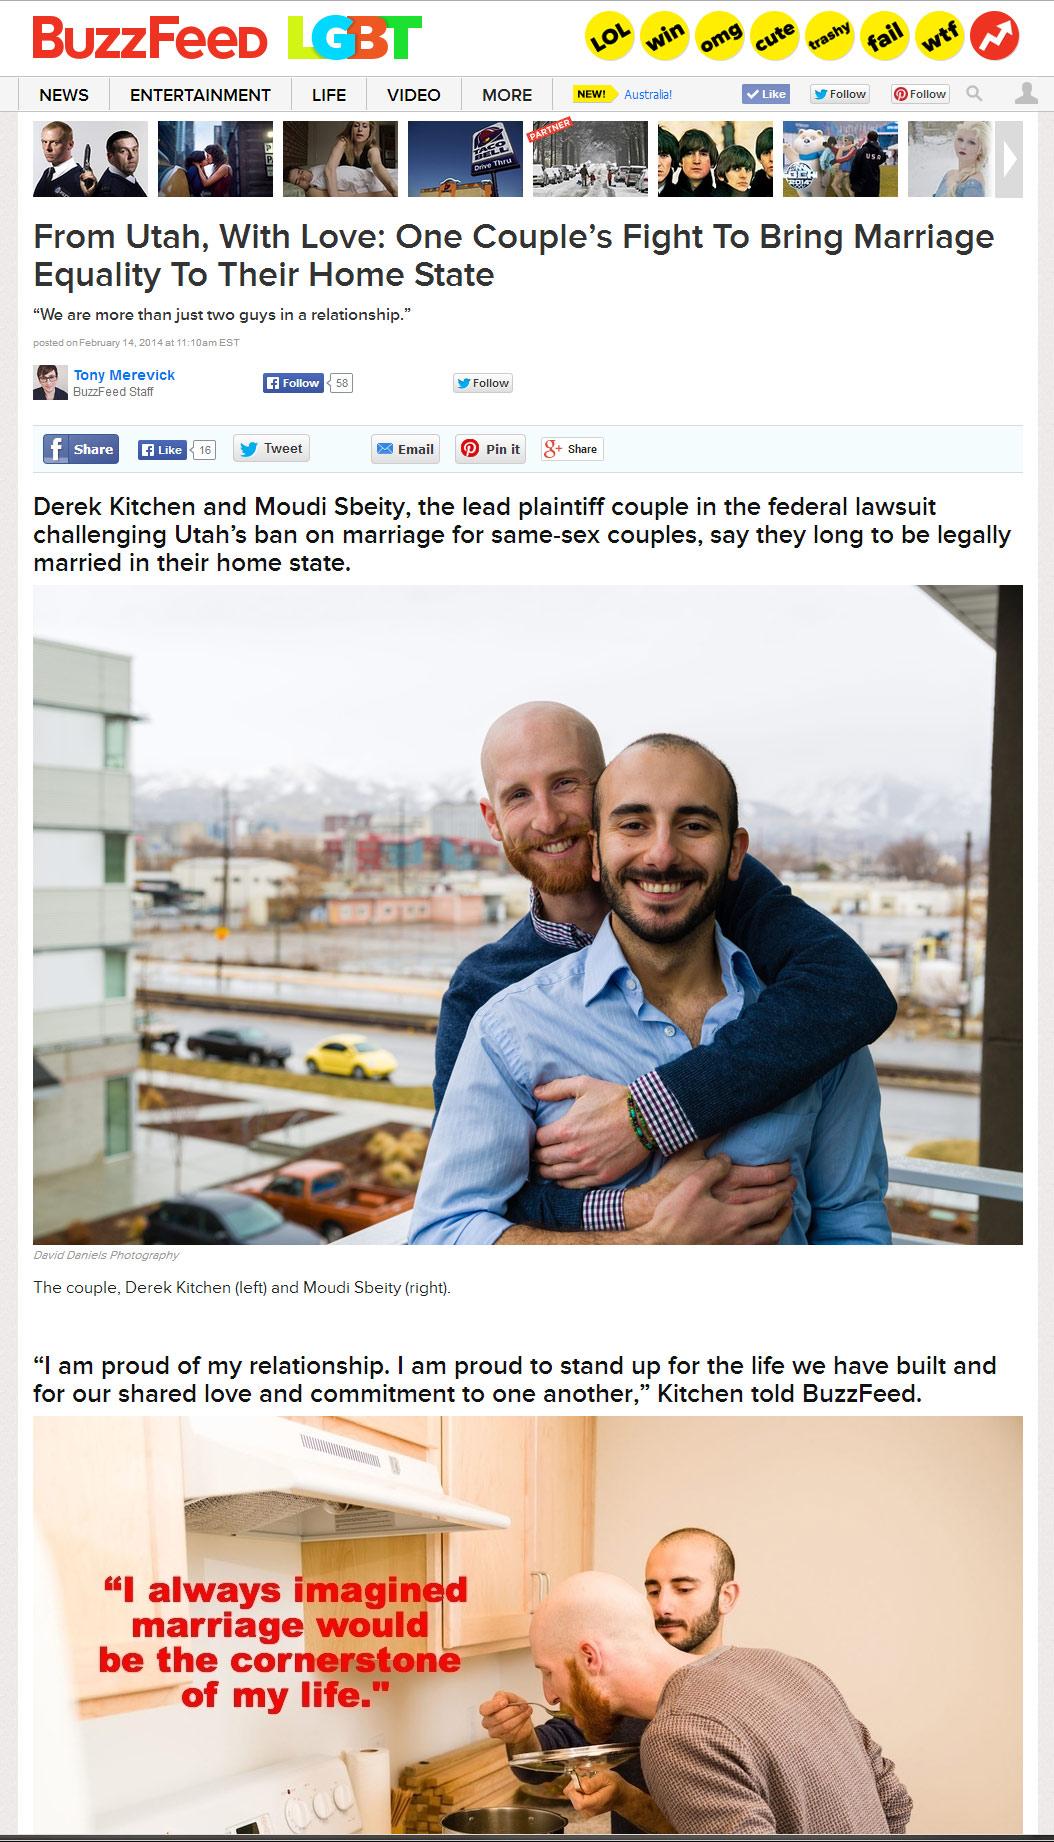 Derek Kitchen & Moudi Sbeity on Buzzfeed with my photography